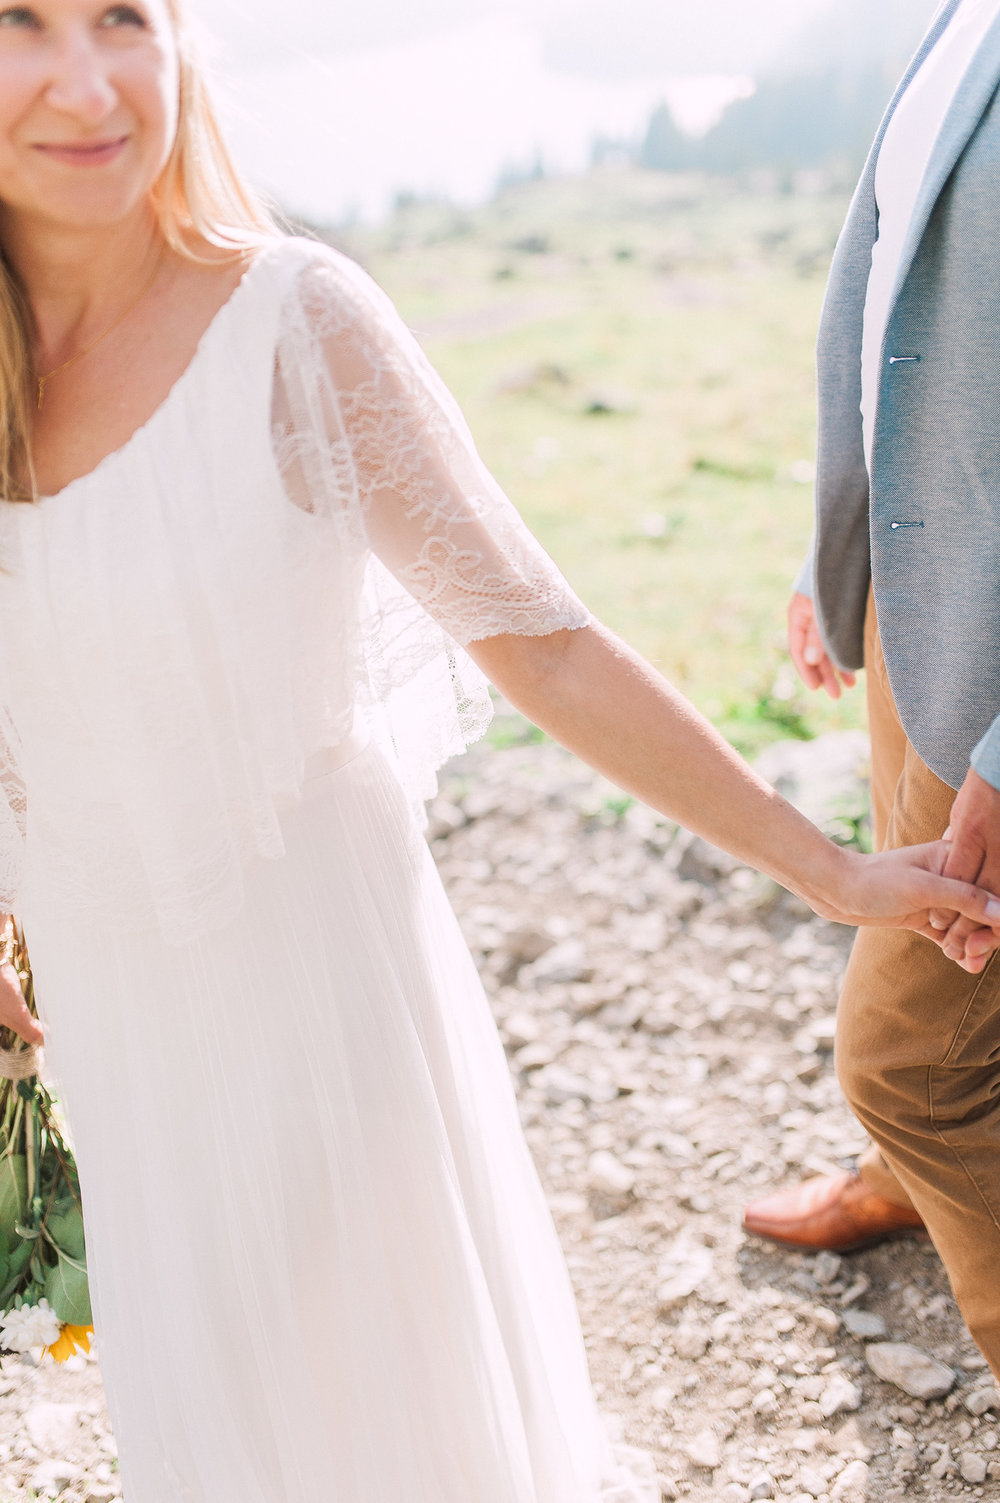 k&m-weddingphotography-6.jpg